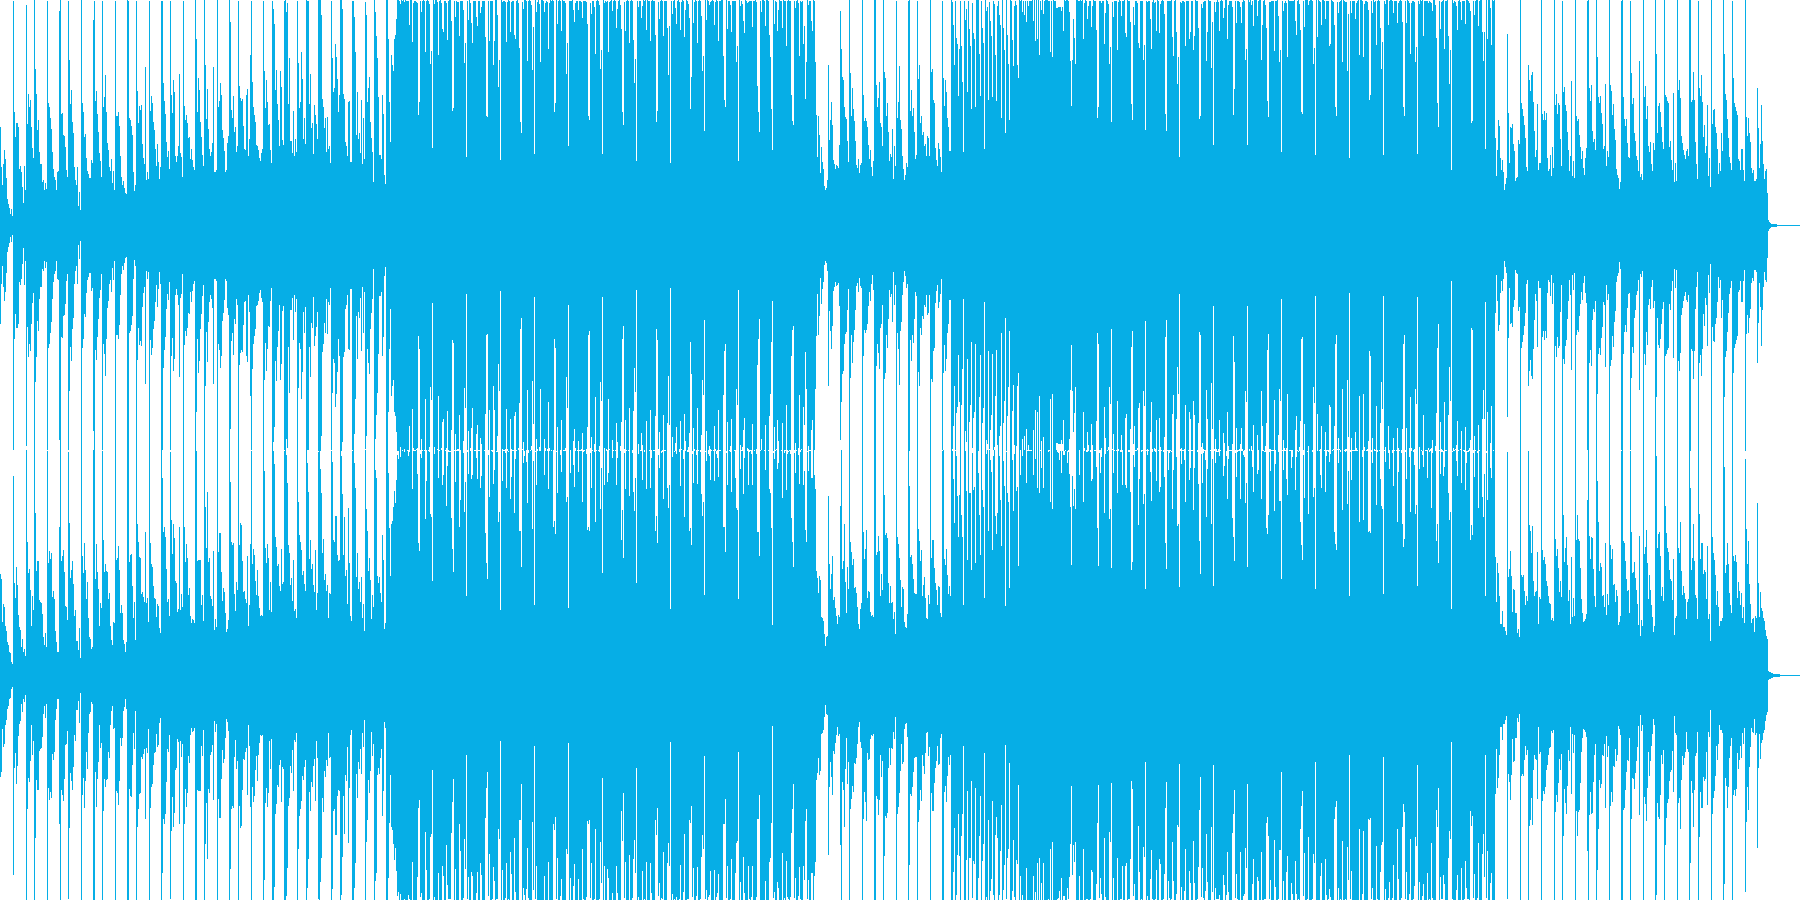 FutureBass1、洋楽、爽快、夏aの再生済みの波形